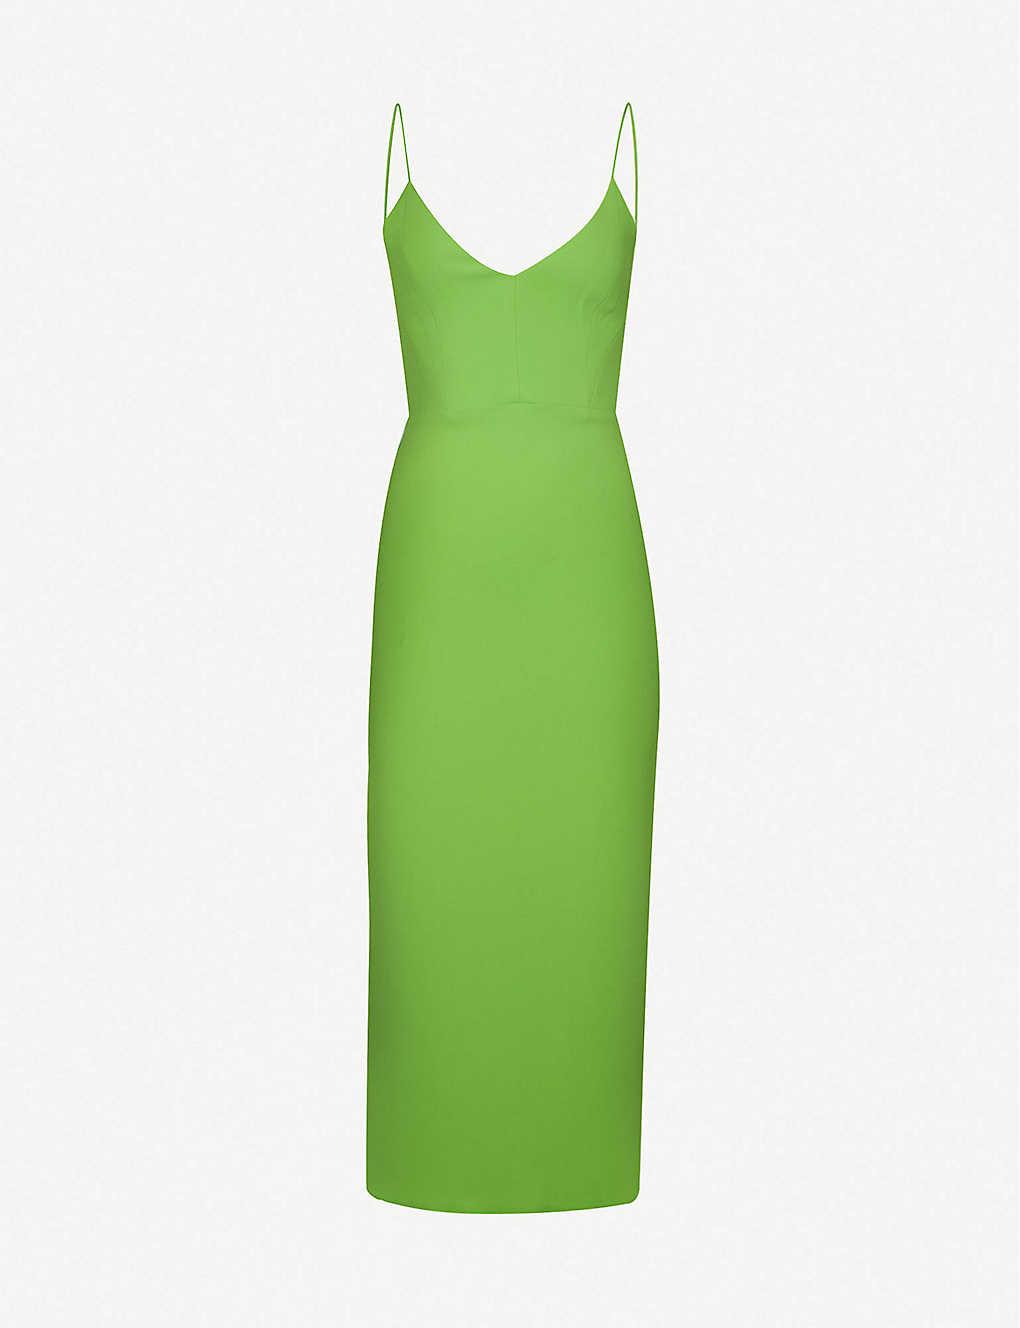 Stretch Crepe Midi Dress (70% off!)